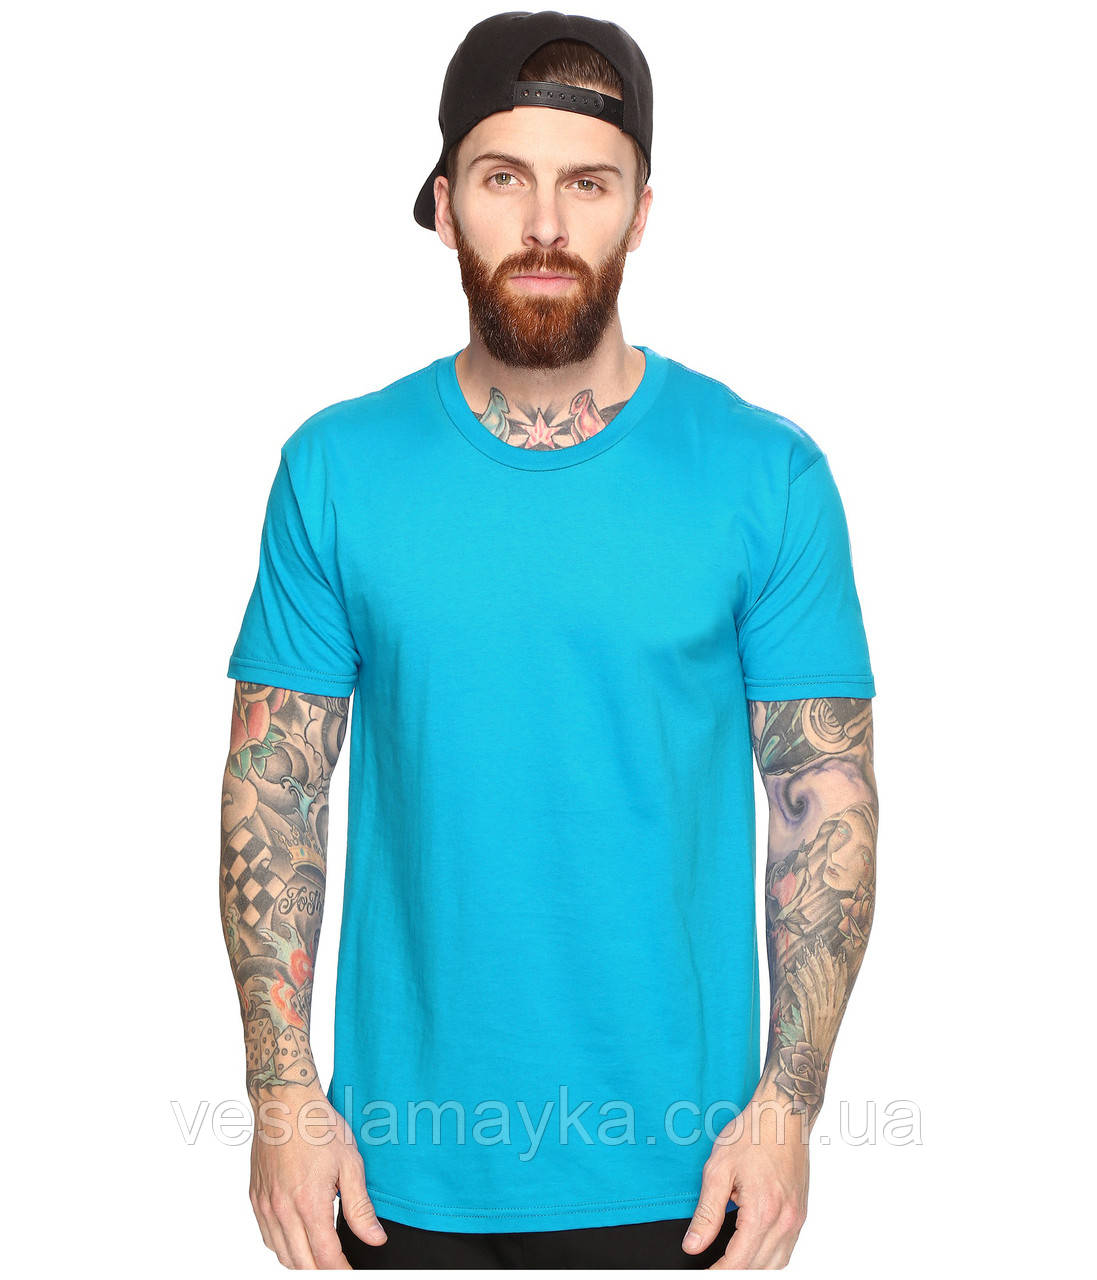 Бірюзова чоловіча футболка (Комфорт)